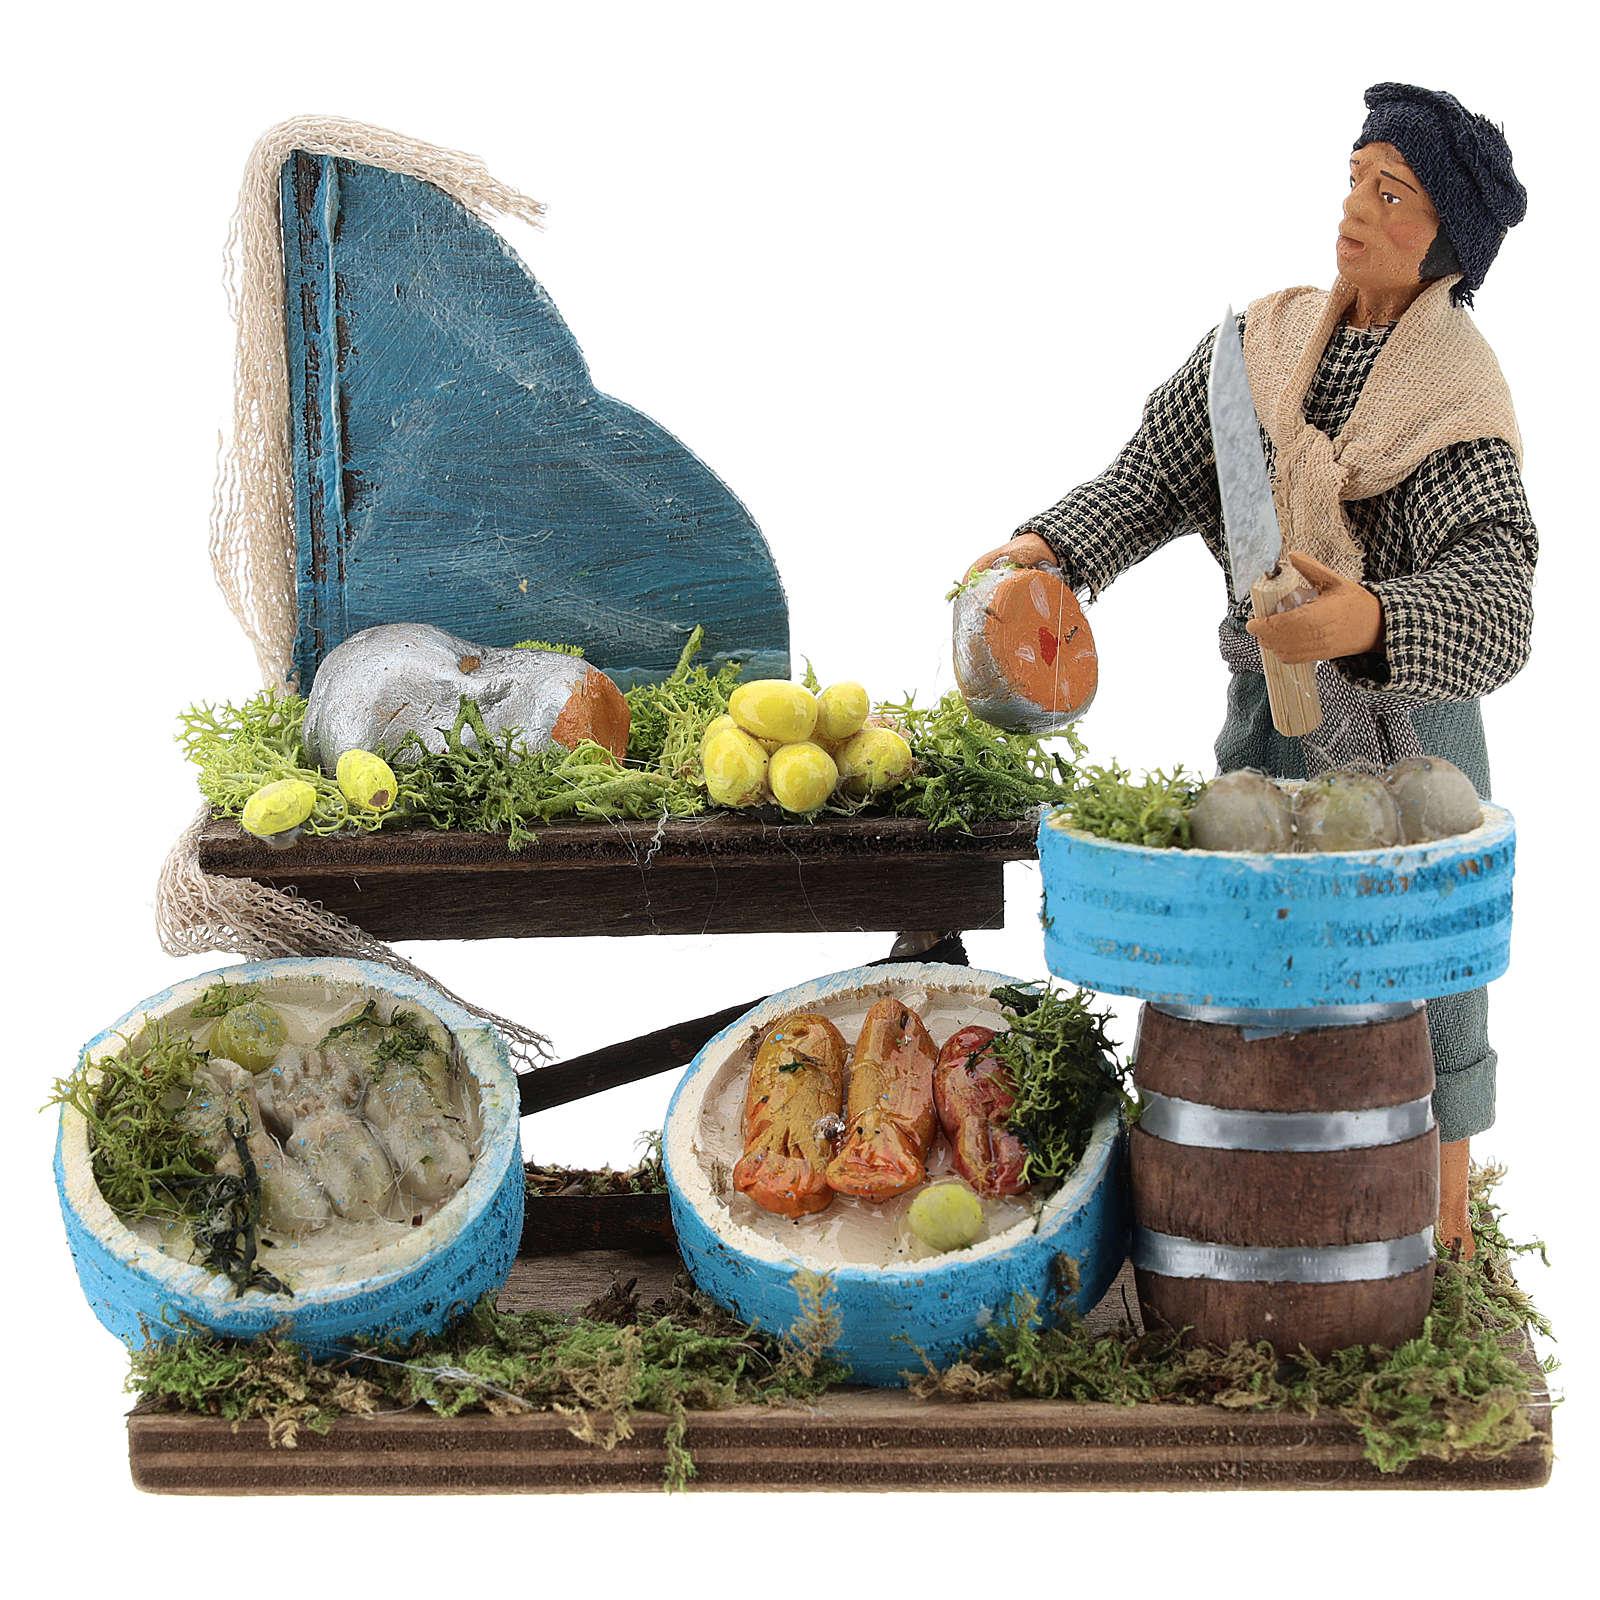 Pescador con banco de maderas 12 cm belén Nápoles 4